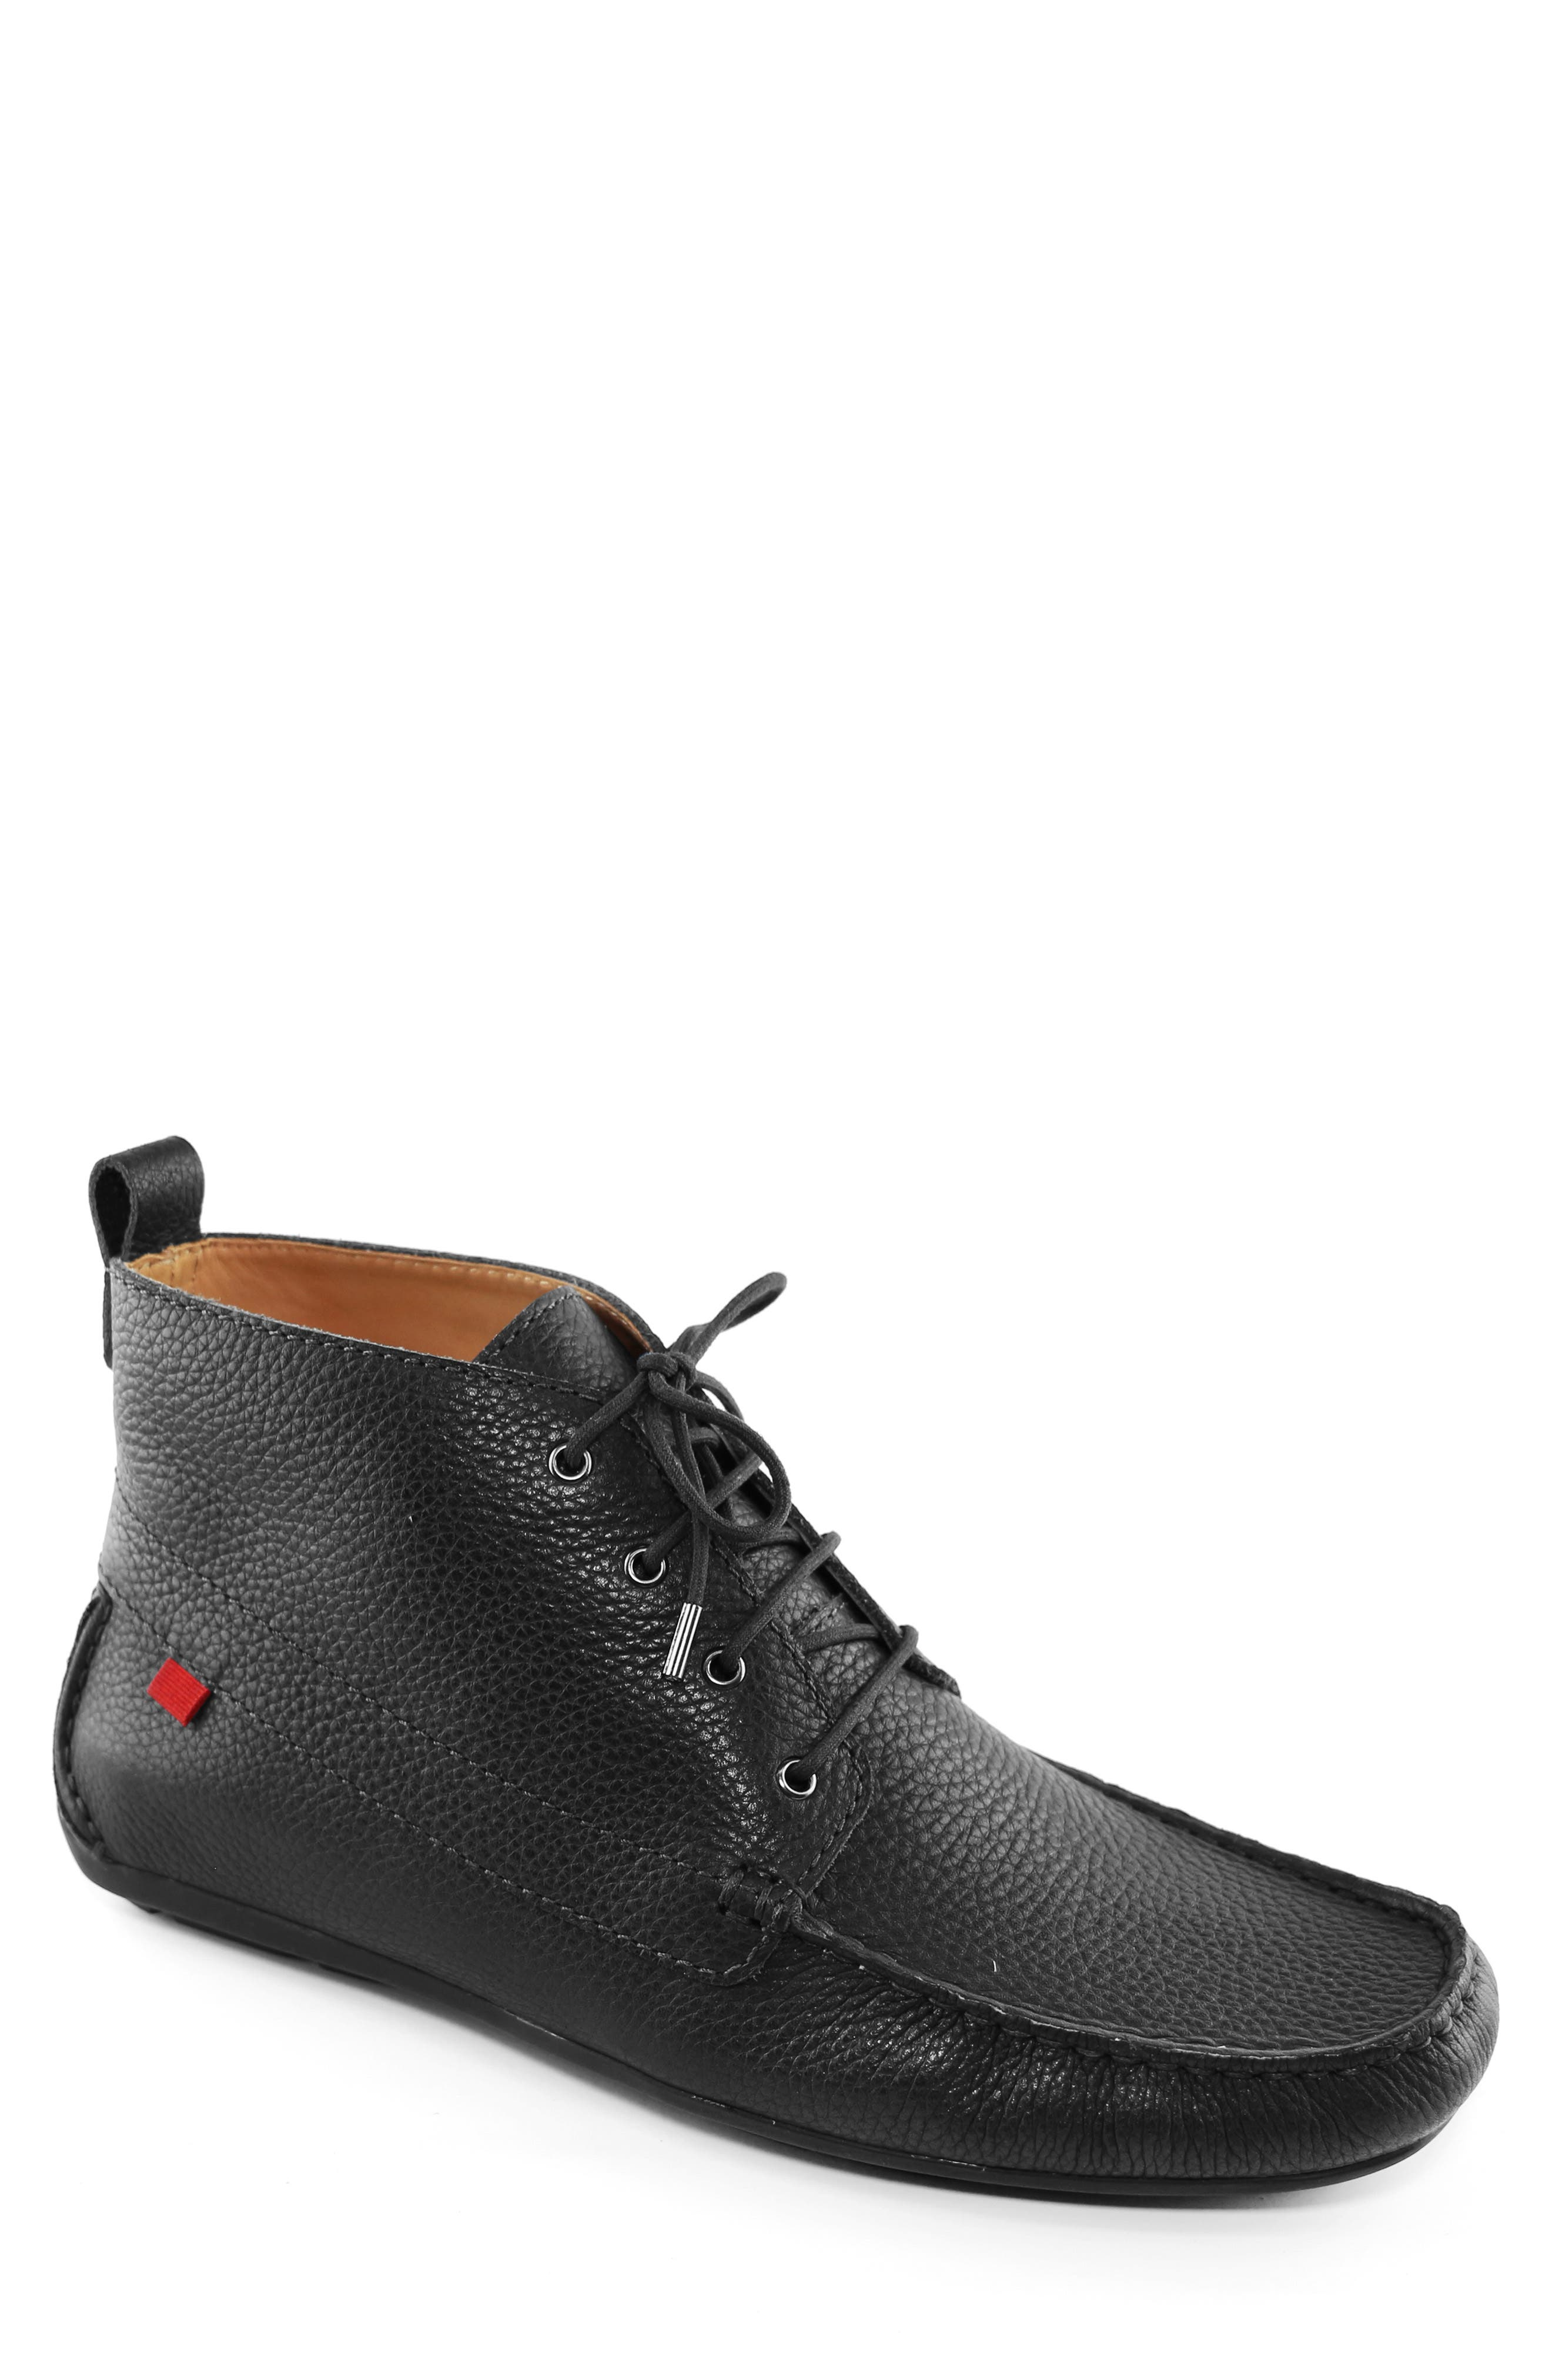 MARC JOSEPH NEW YORK Soho Boot 2 Chukka Boot, Main, color, BLACK LEATHER